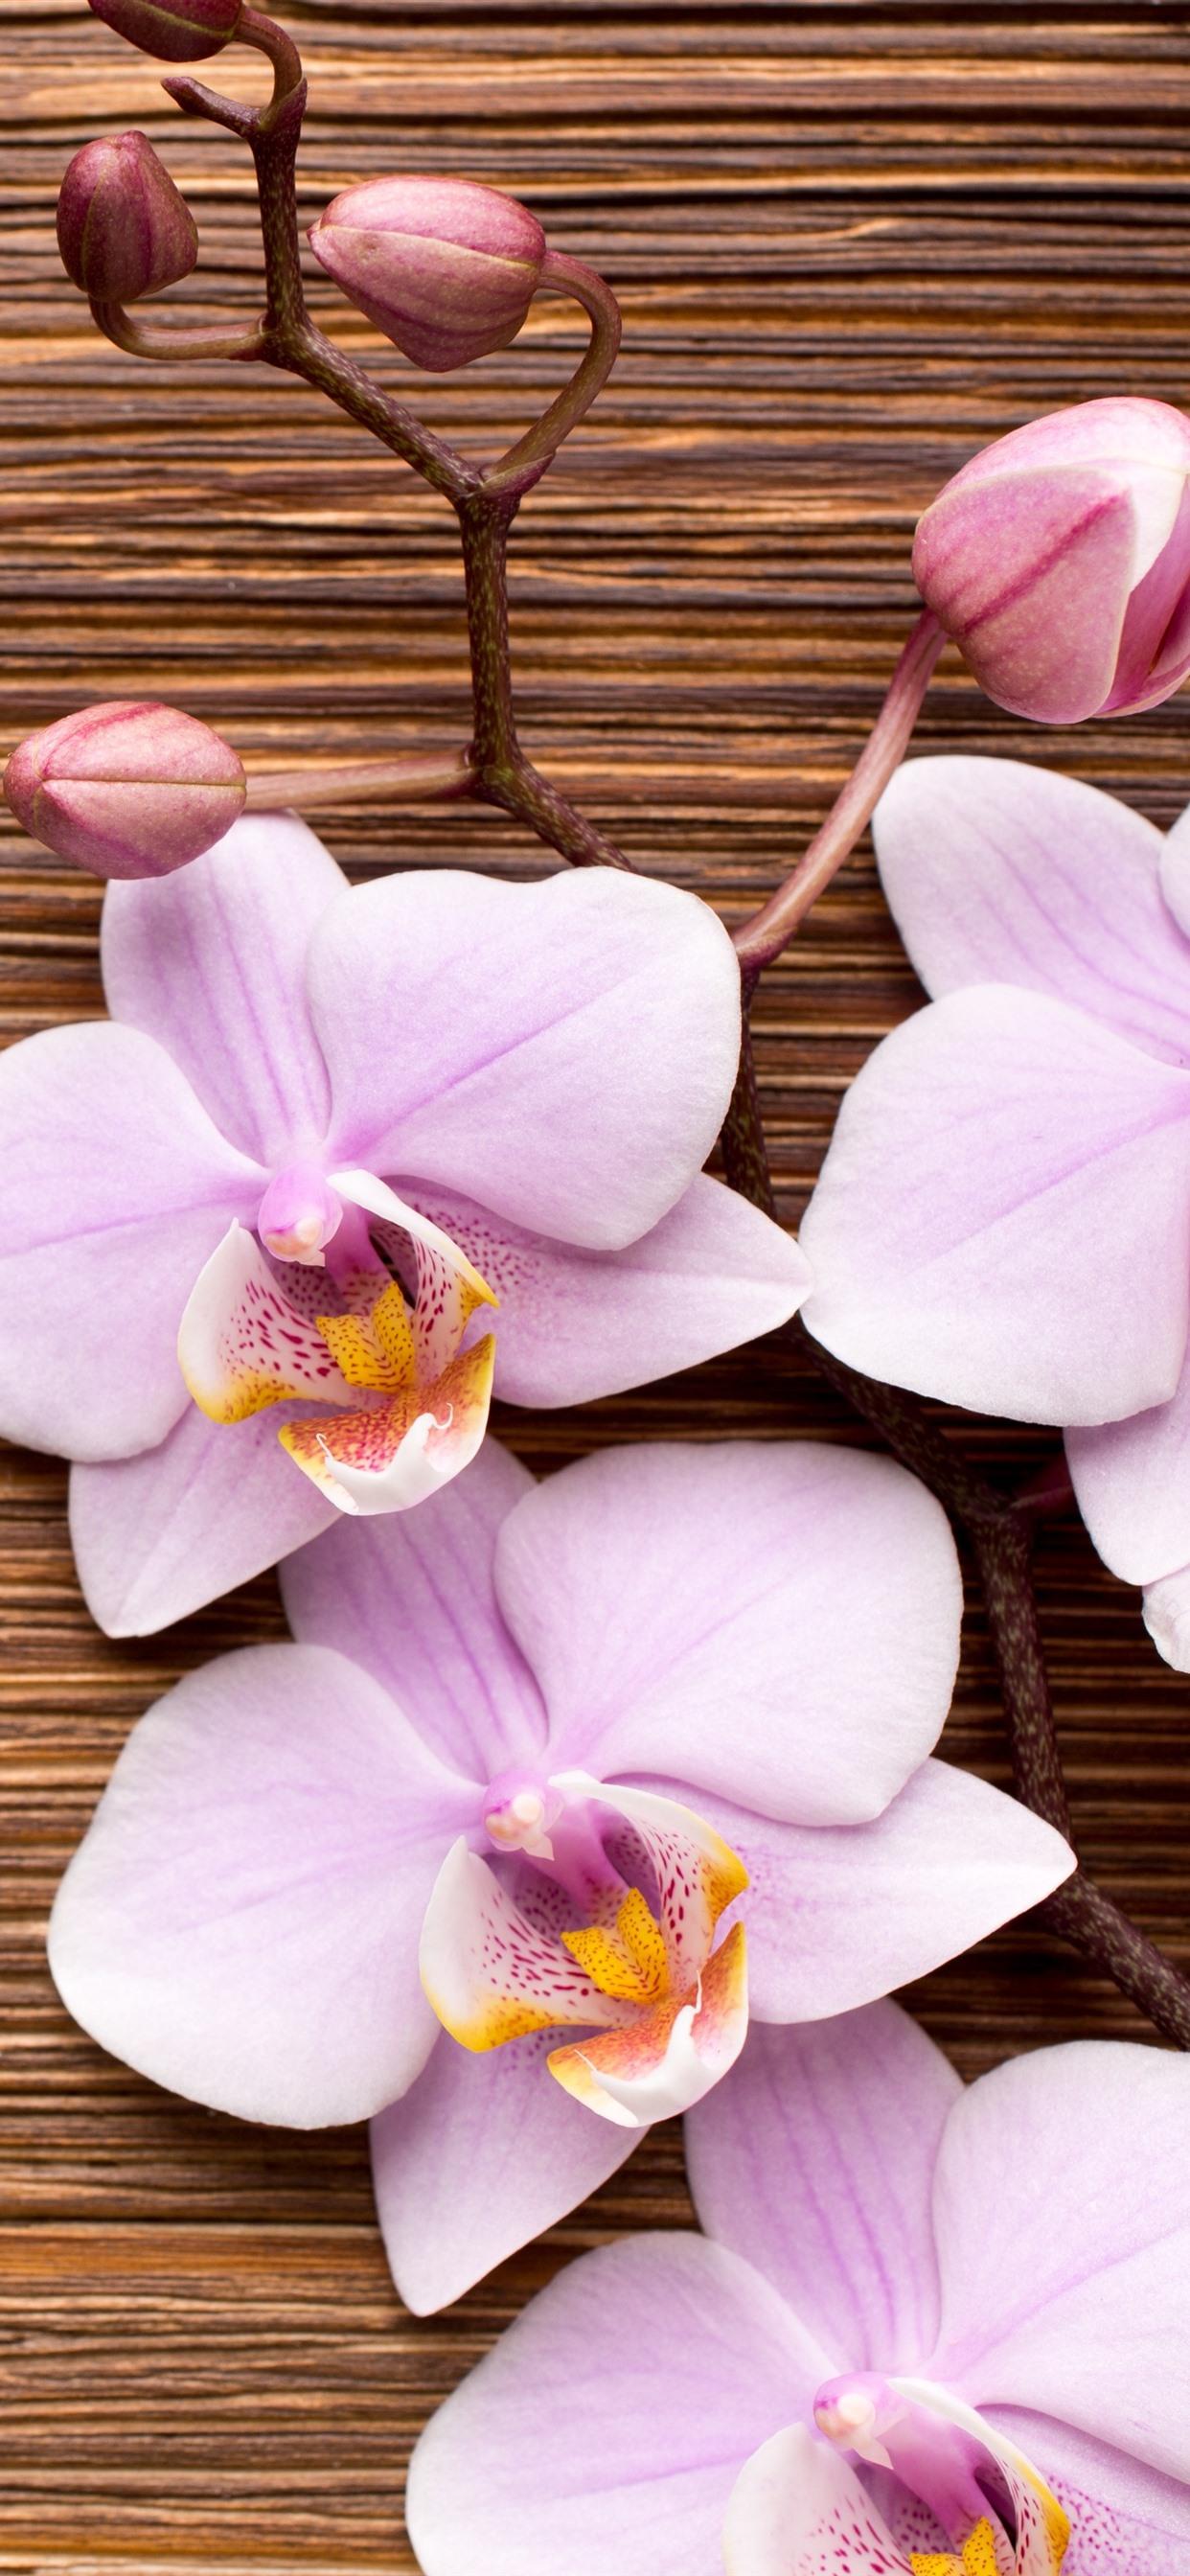 Light Pink Phalaenopsis Flowers Wood Board 1242x2688